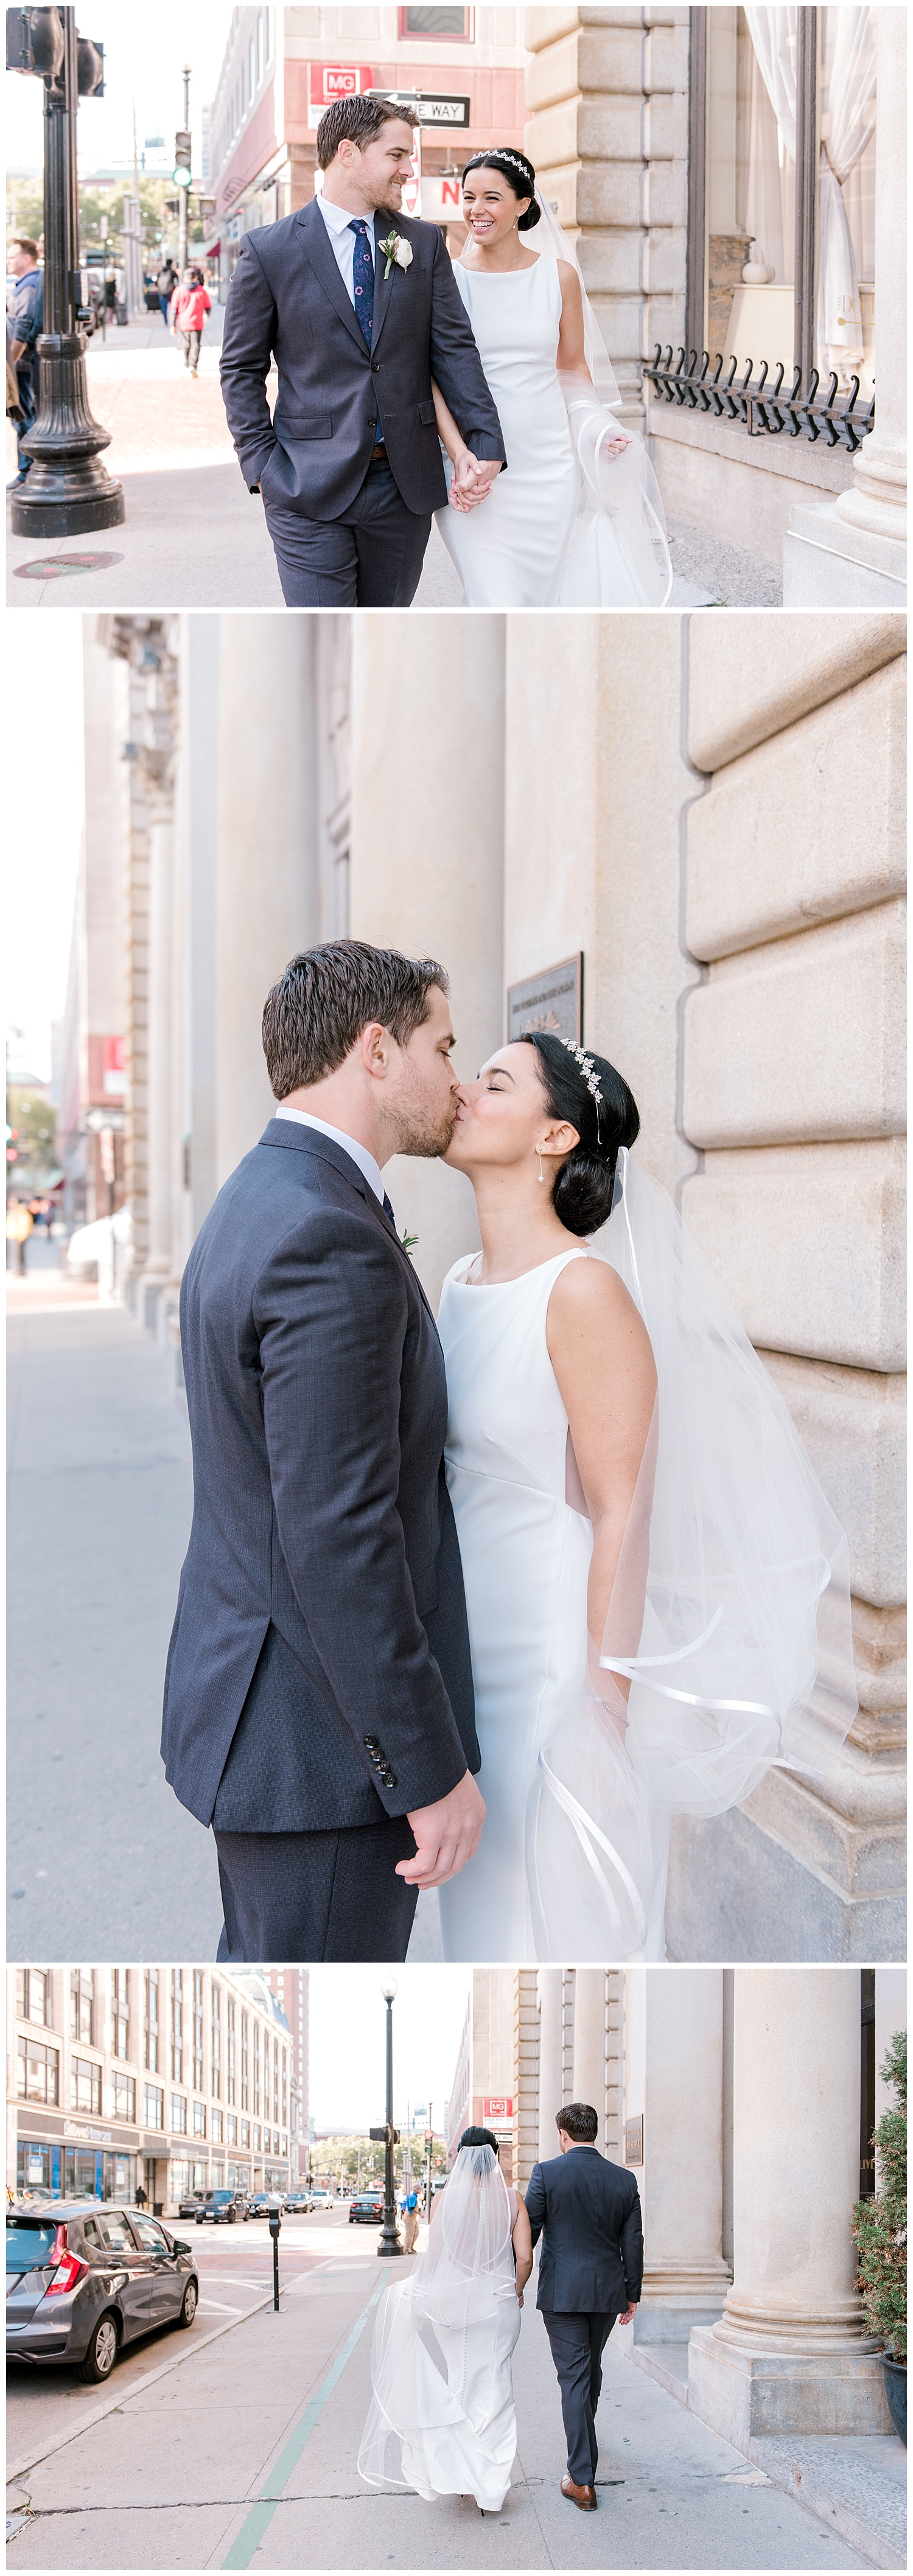 the-dorrance-providence-wedding-photography-october19-photo-21.jpg